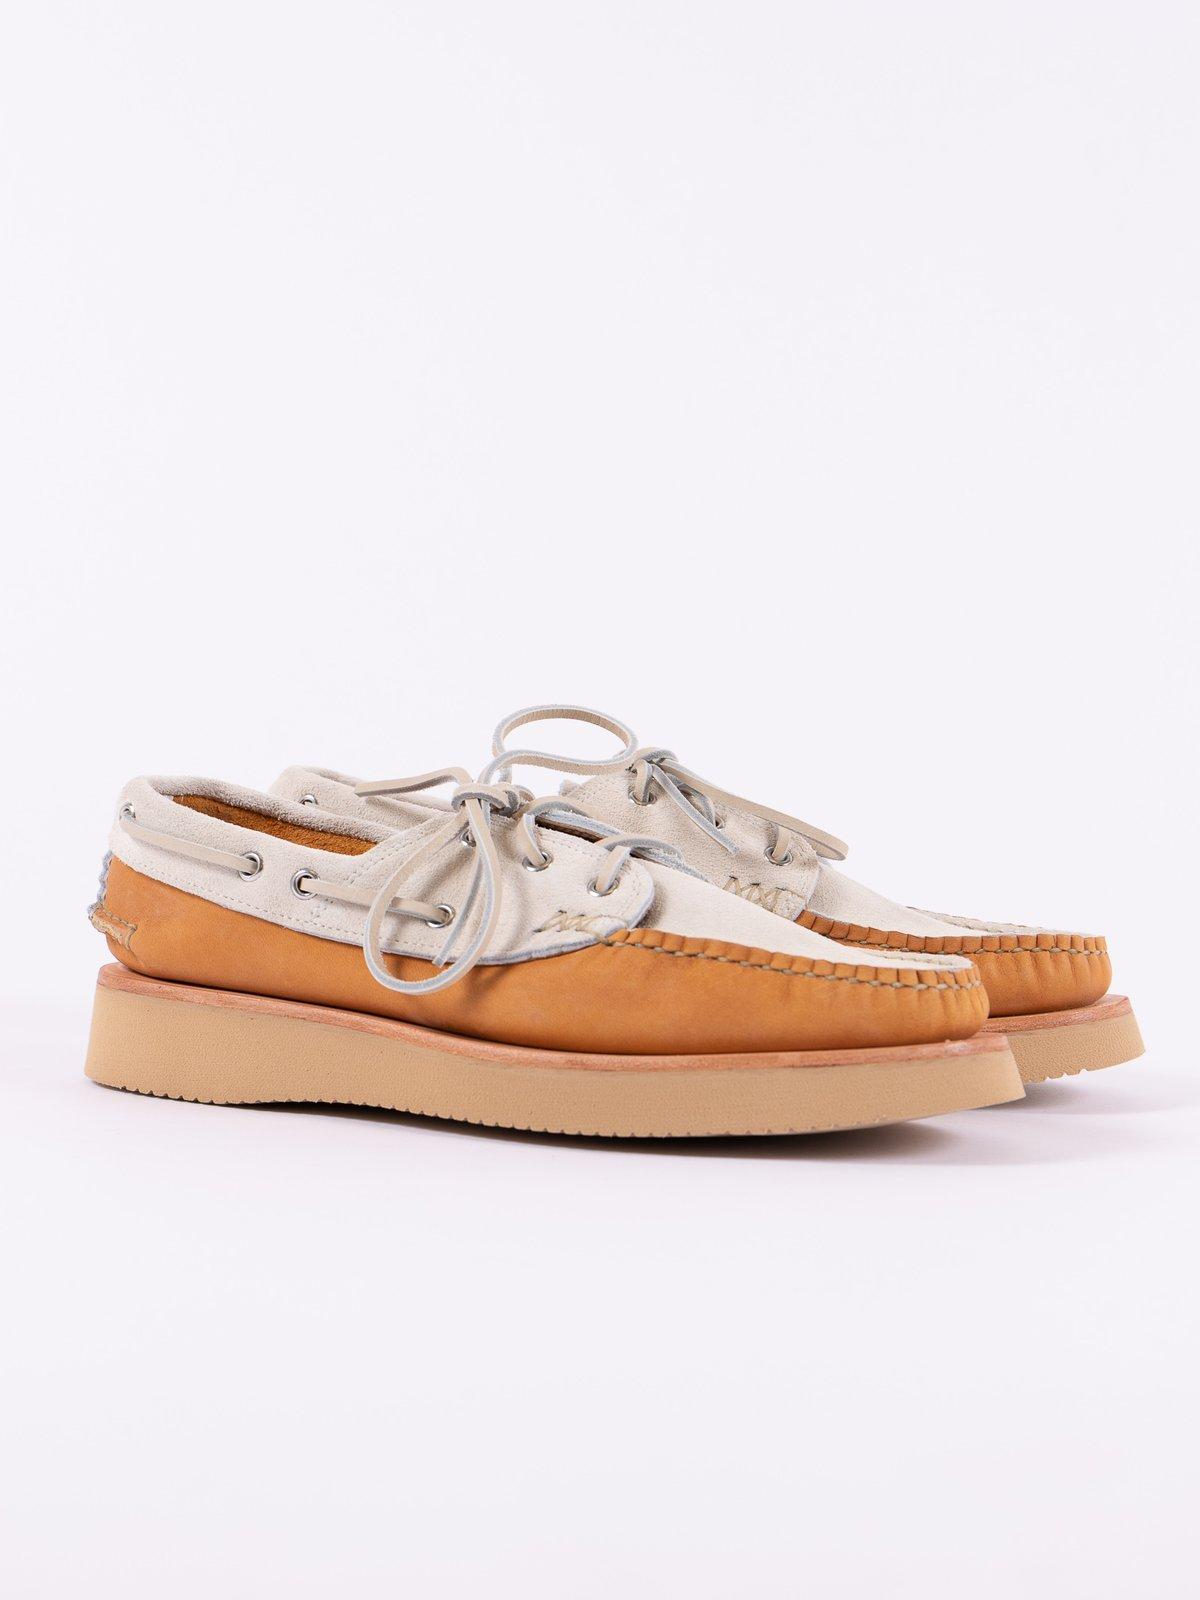 BB Tan/FO White Boat Shoe Exclusive - Image 1